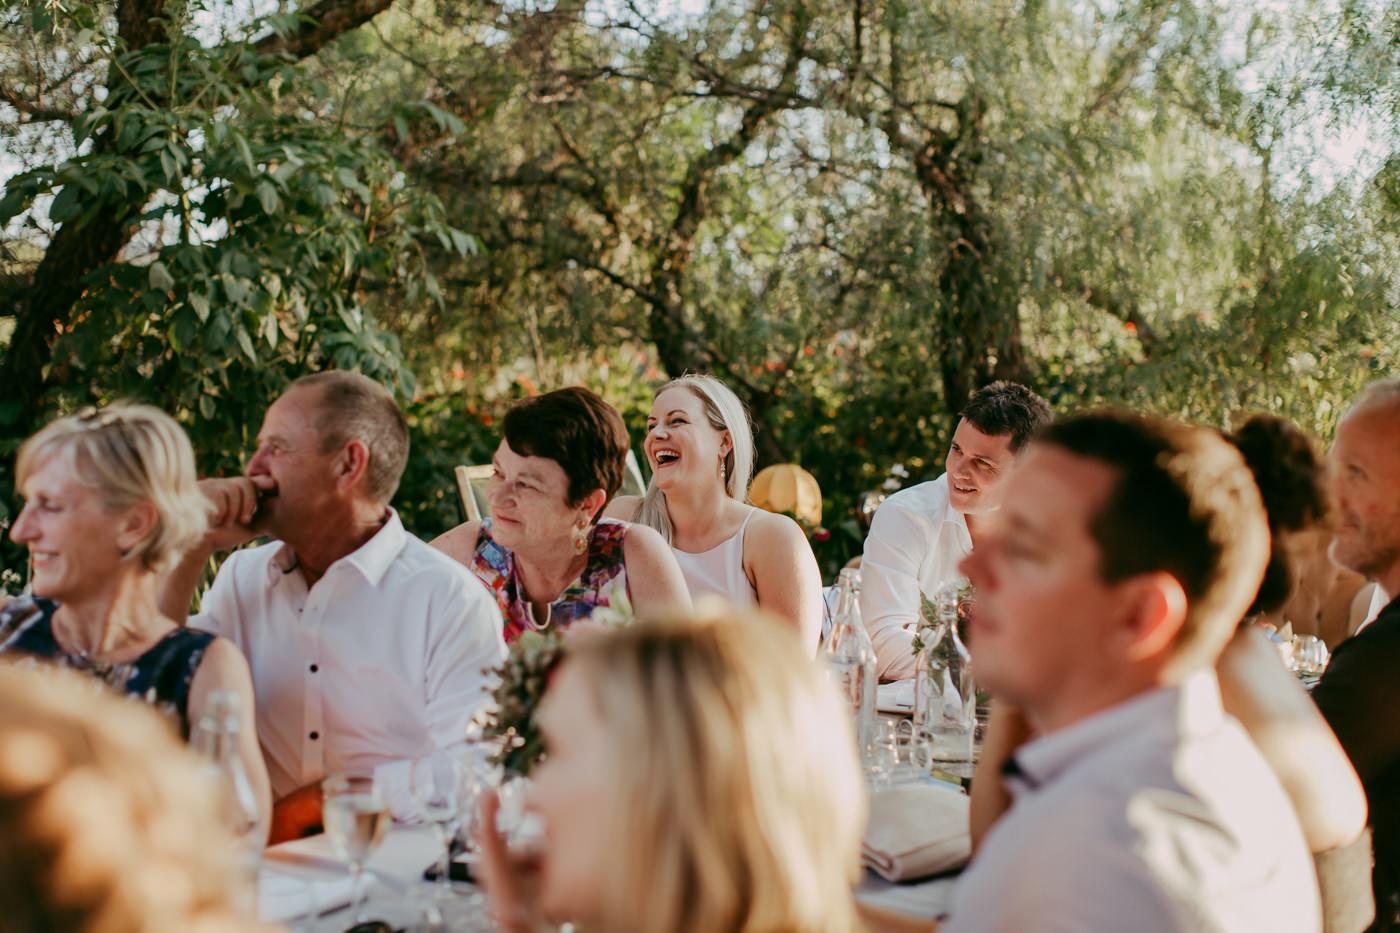 Anthony & Eliet - Wagga Wagga Wedding - Country NSW - Samantha Heather Photography-136.jpg